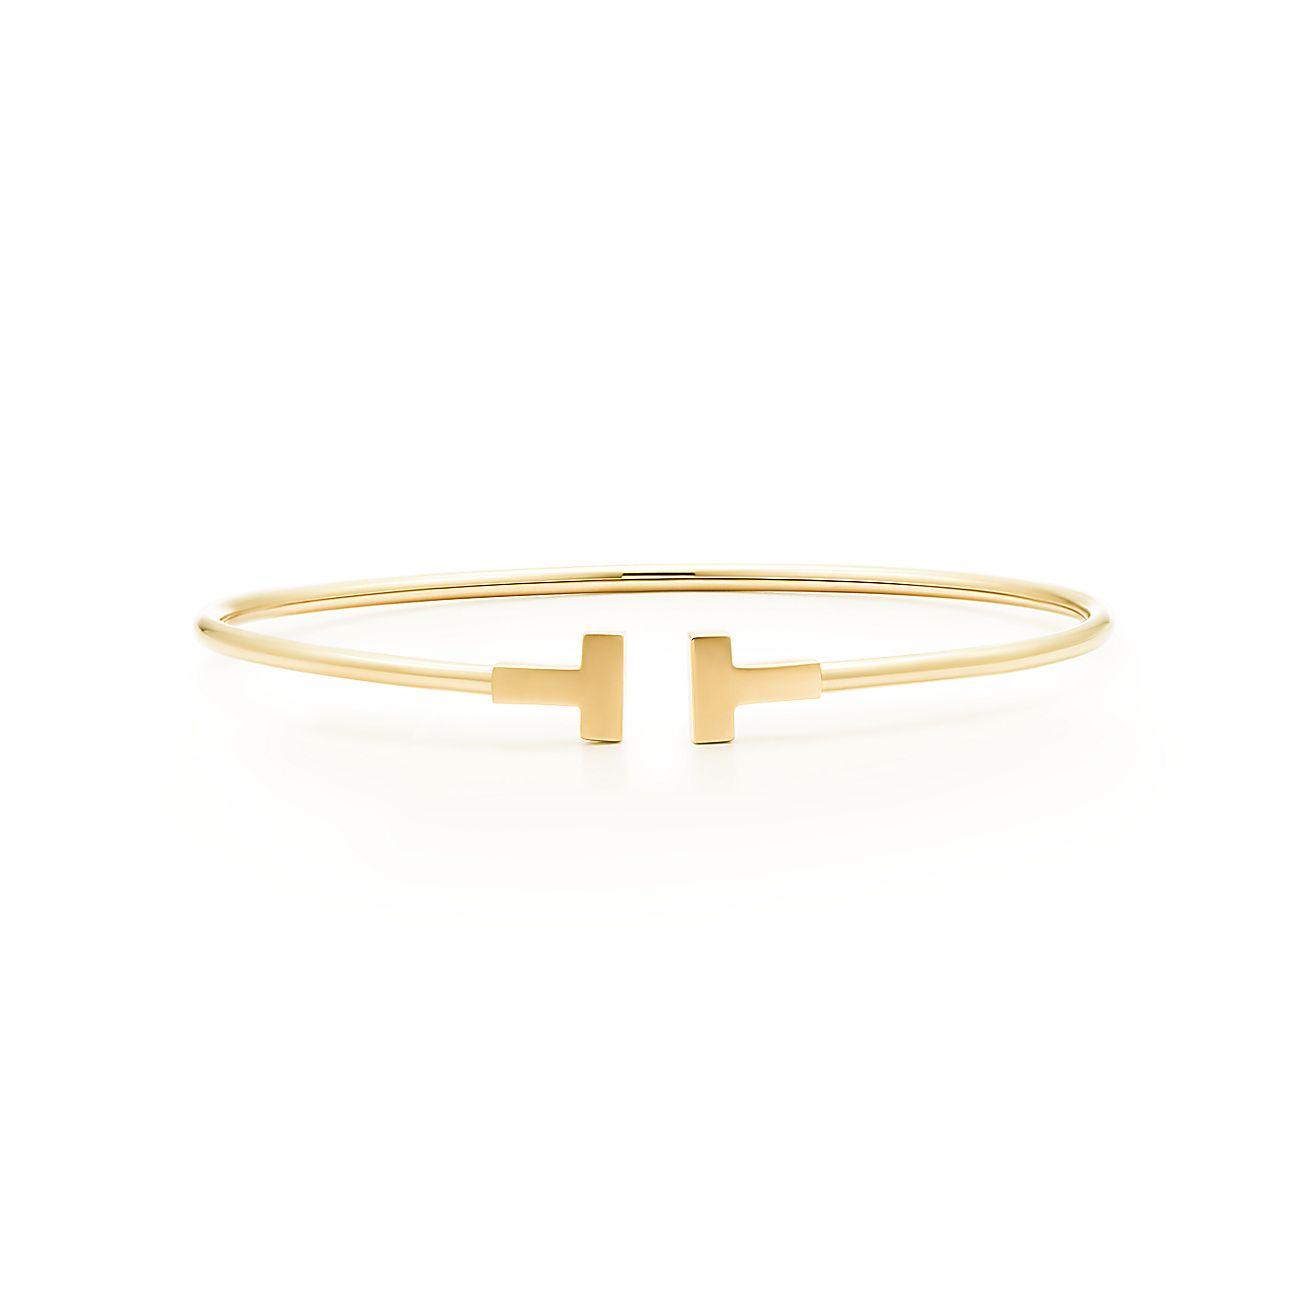 tiffany t narrow wire bracelet in 18k gold medium. Black Bedroom Furniture Sets. Home Design Ideas